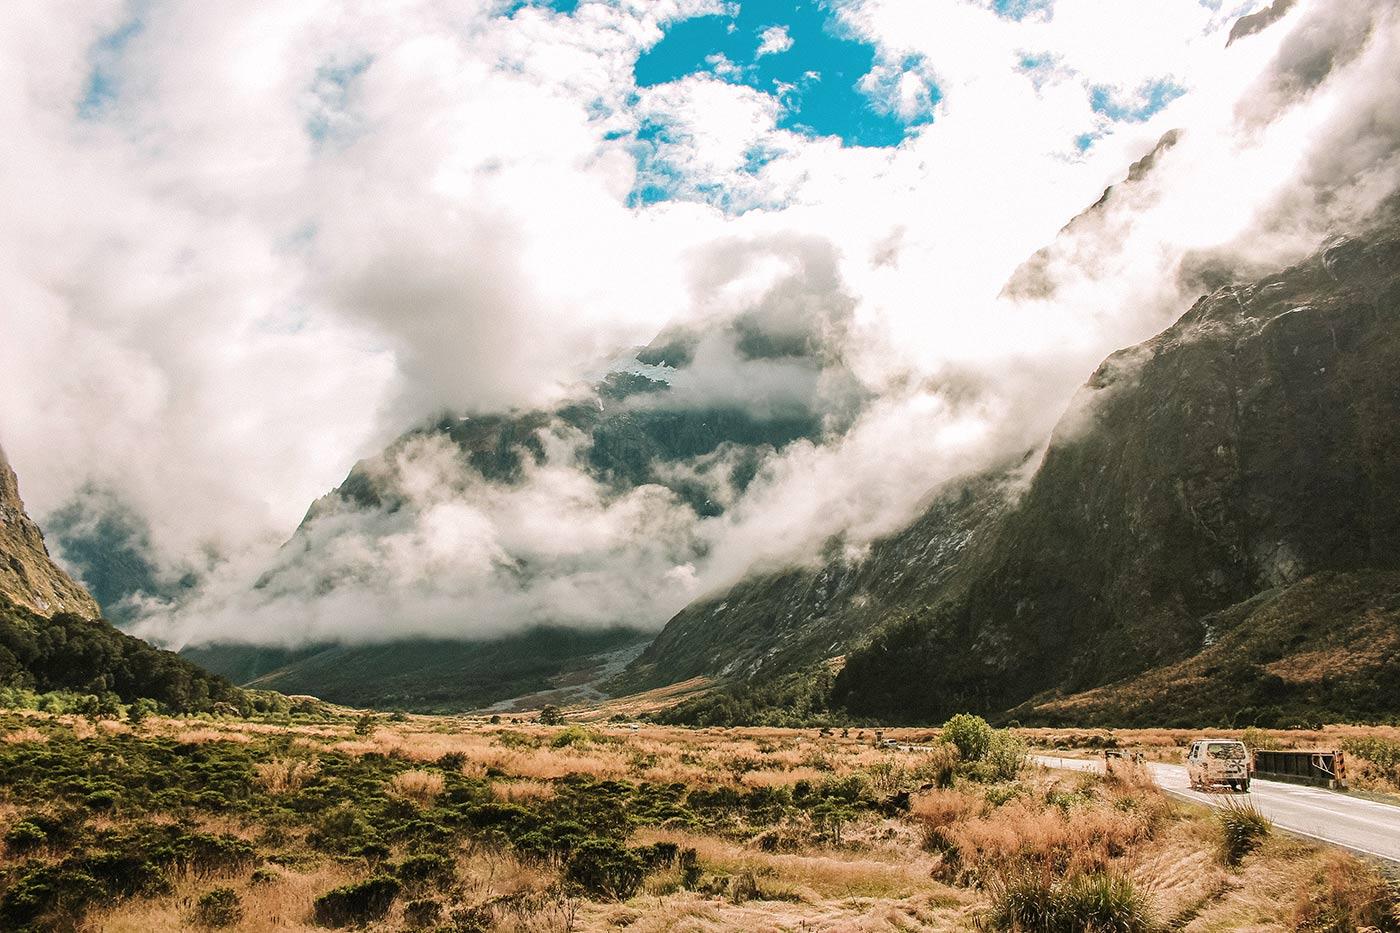 A day trip to Milford Sound, New Zealand blog post Monkey Creek